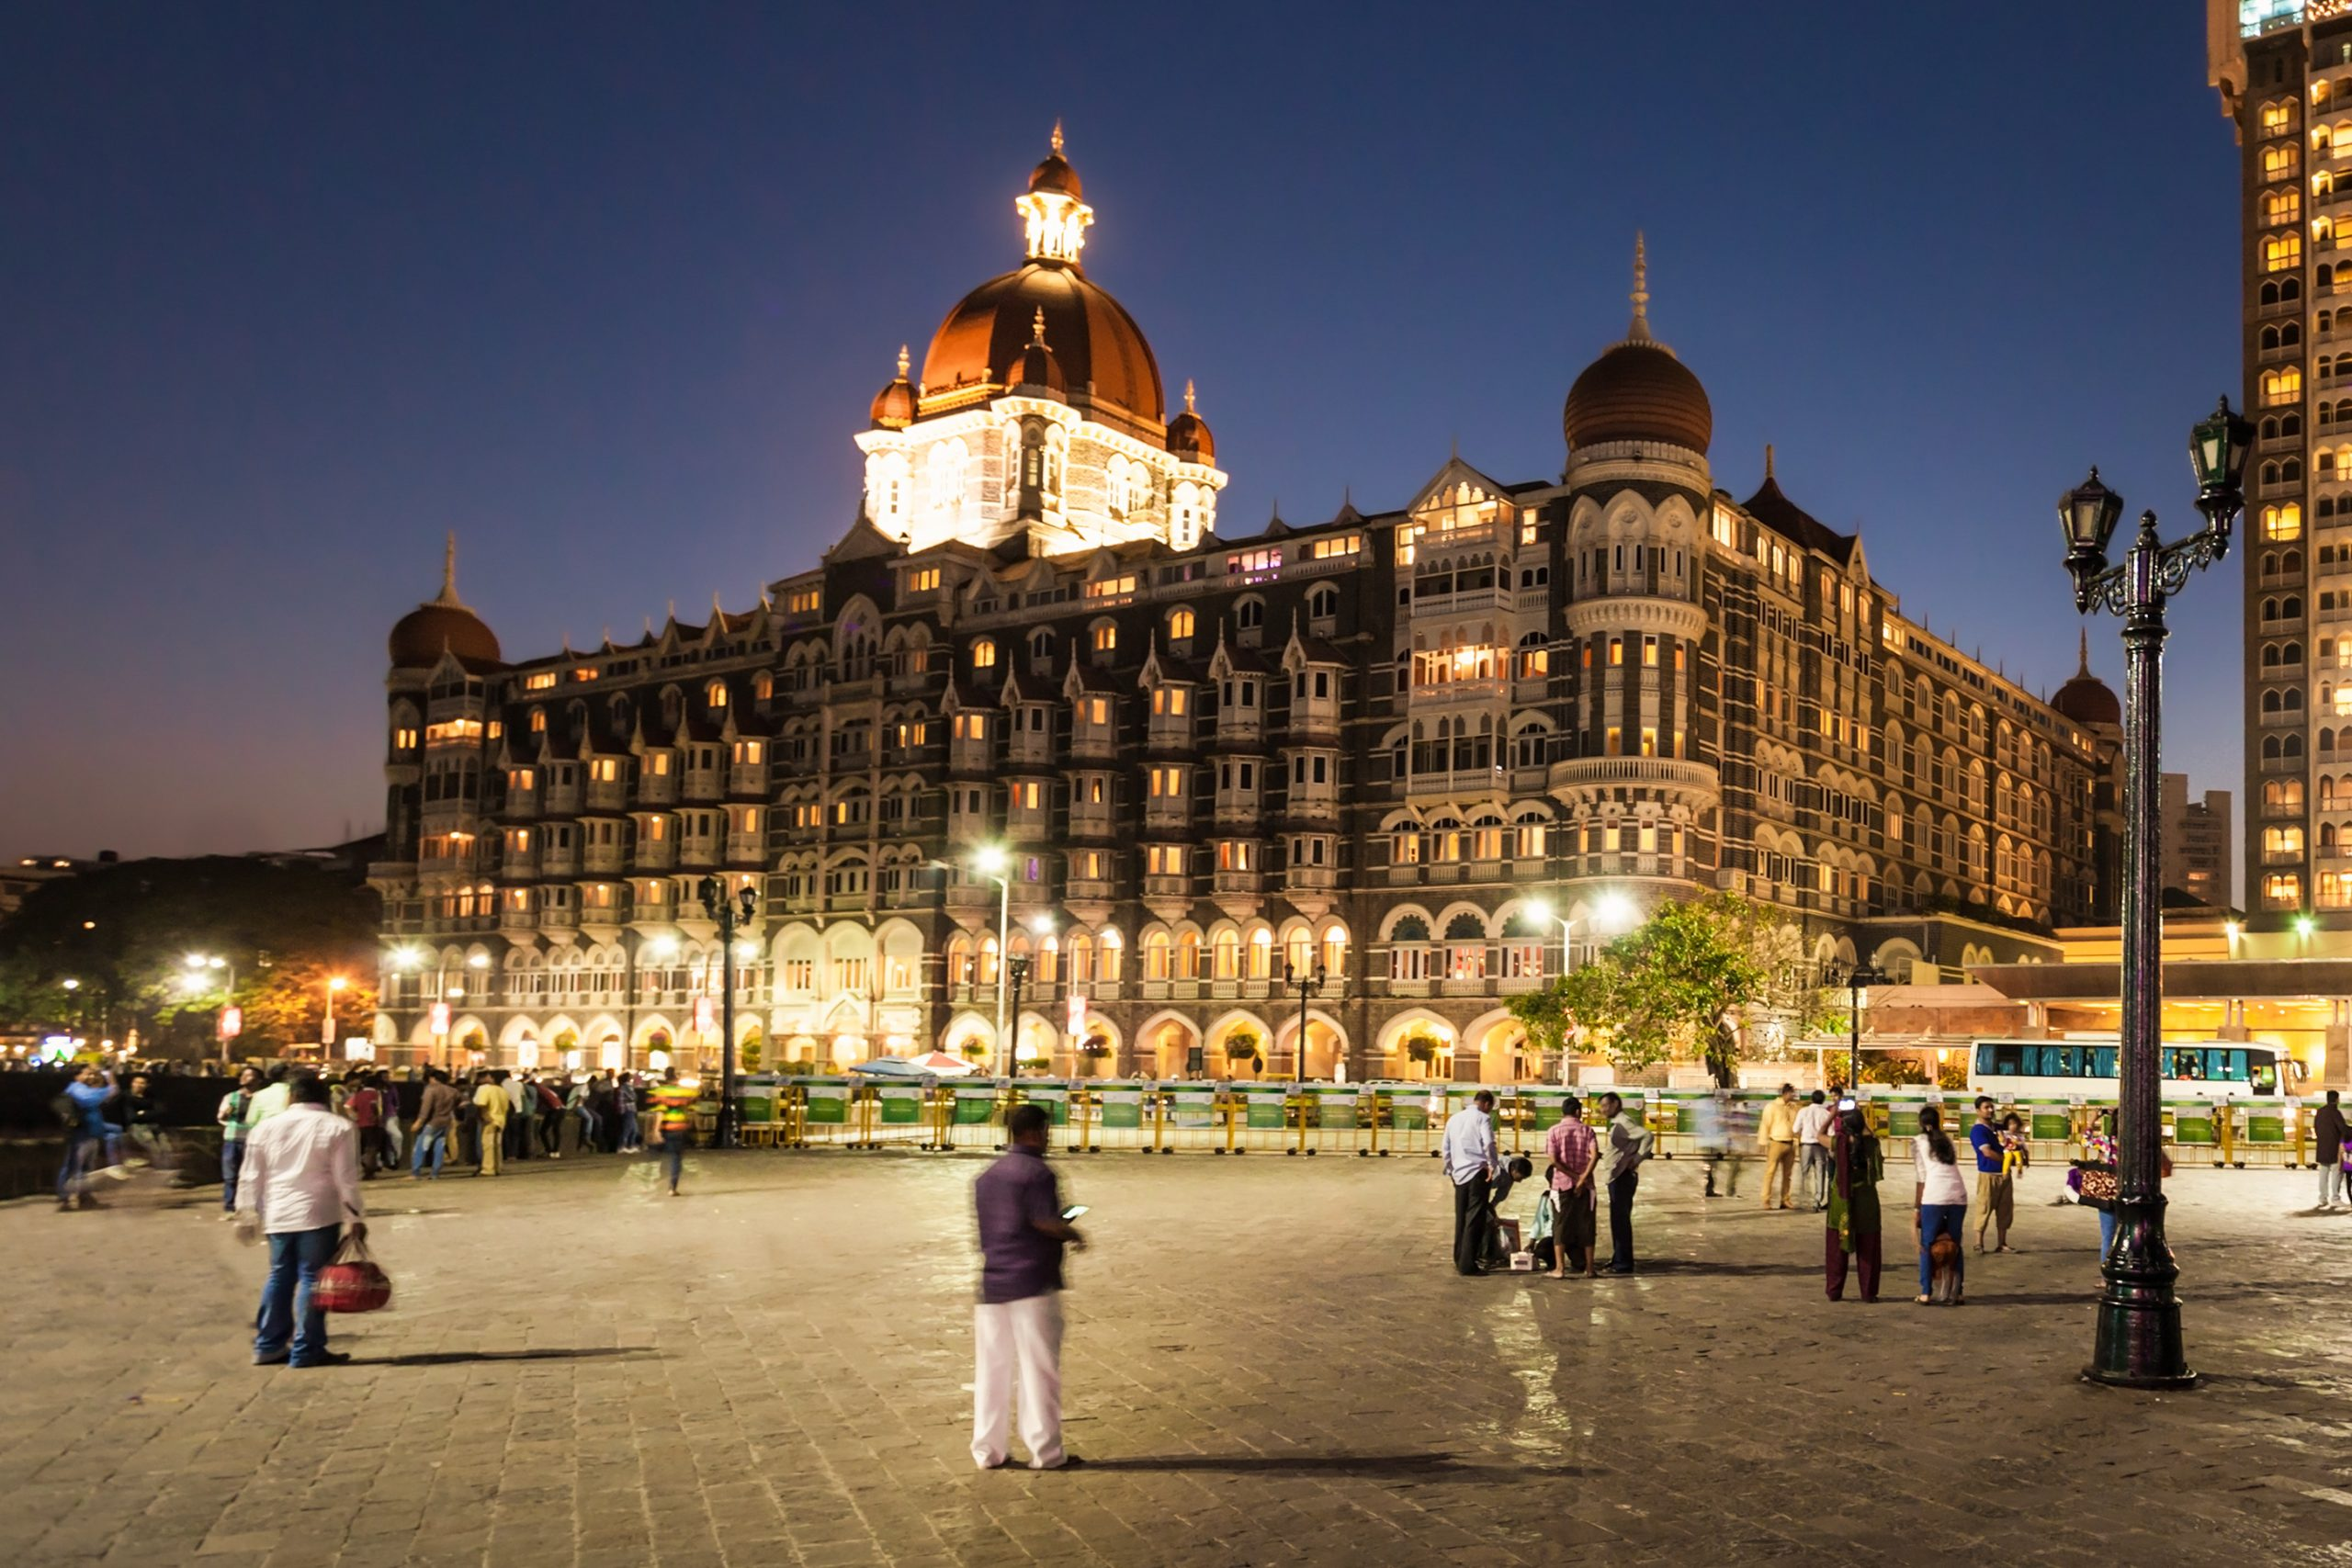 The Taj Mahal Palace Hotel at night.